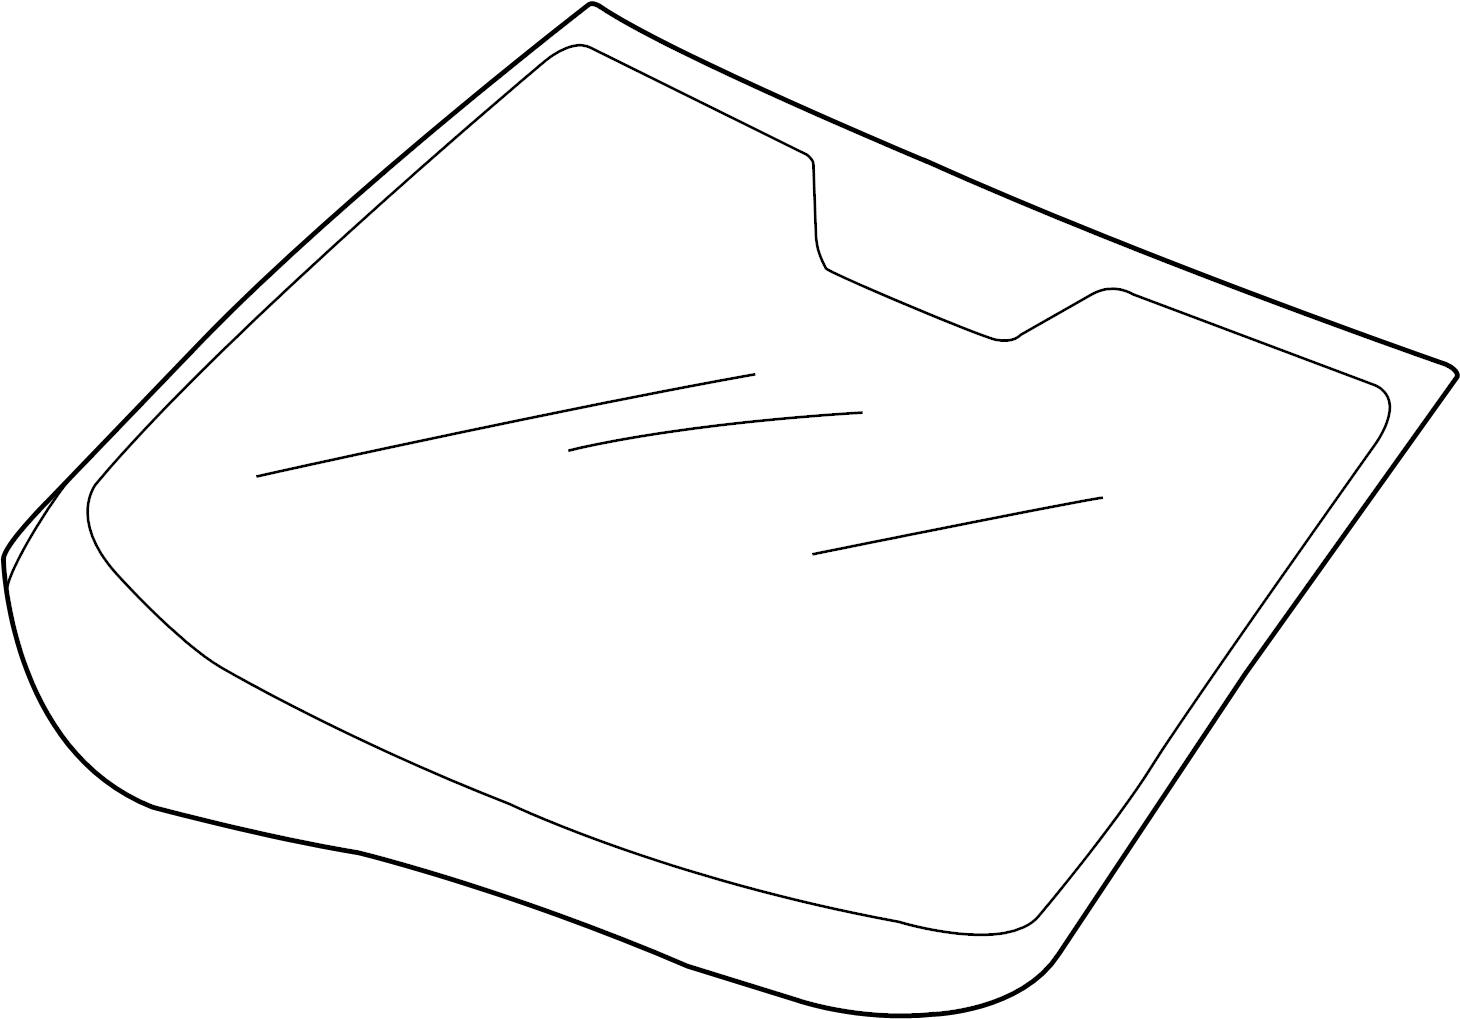 T0ga11